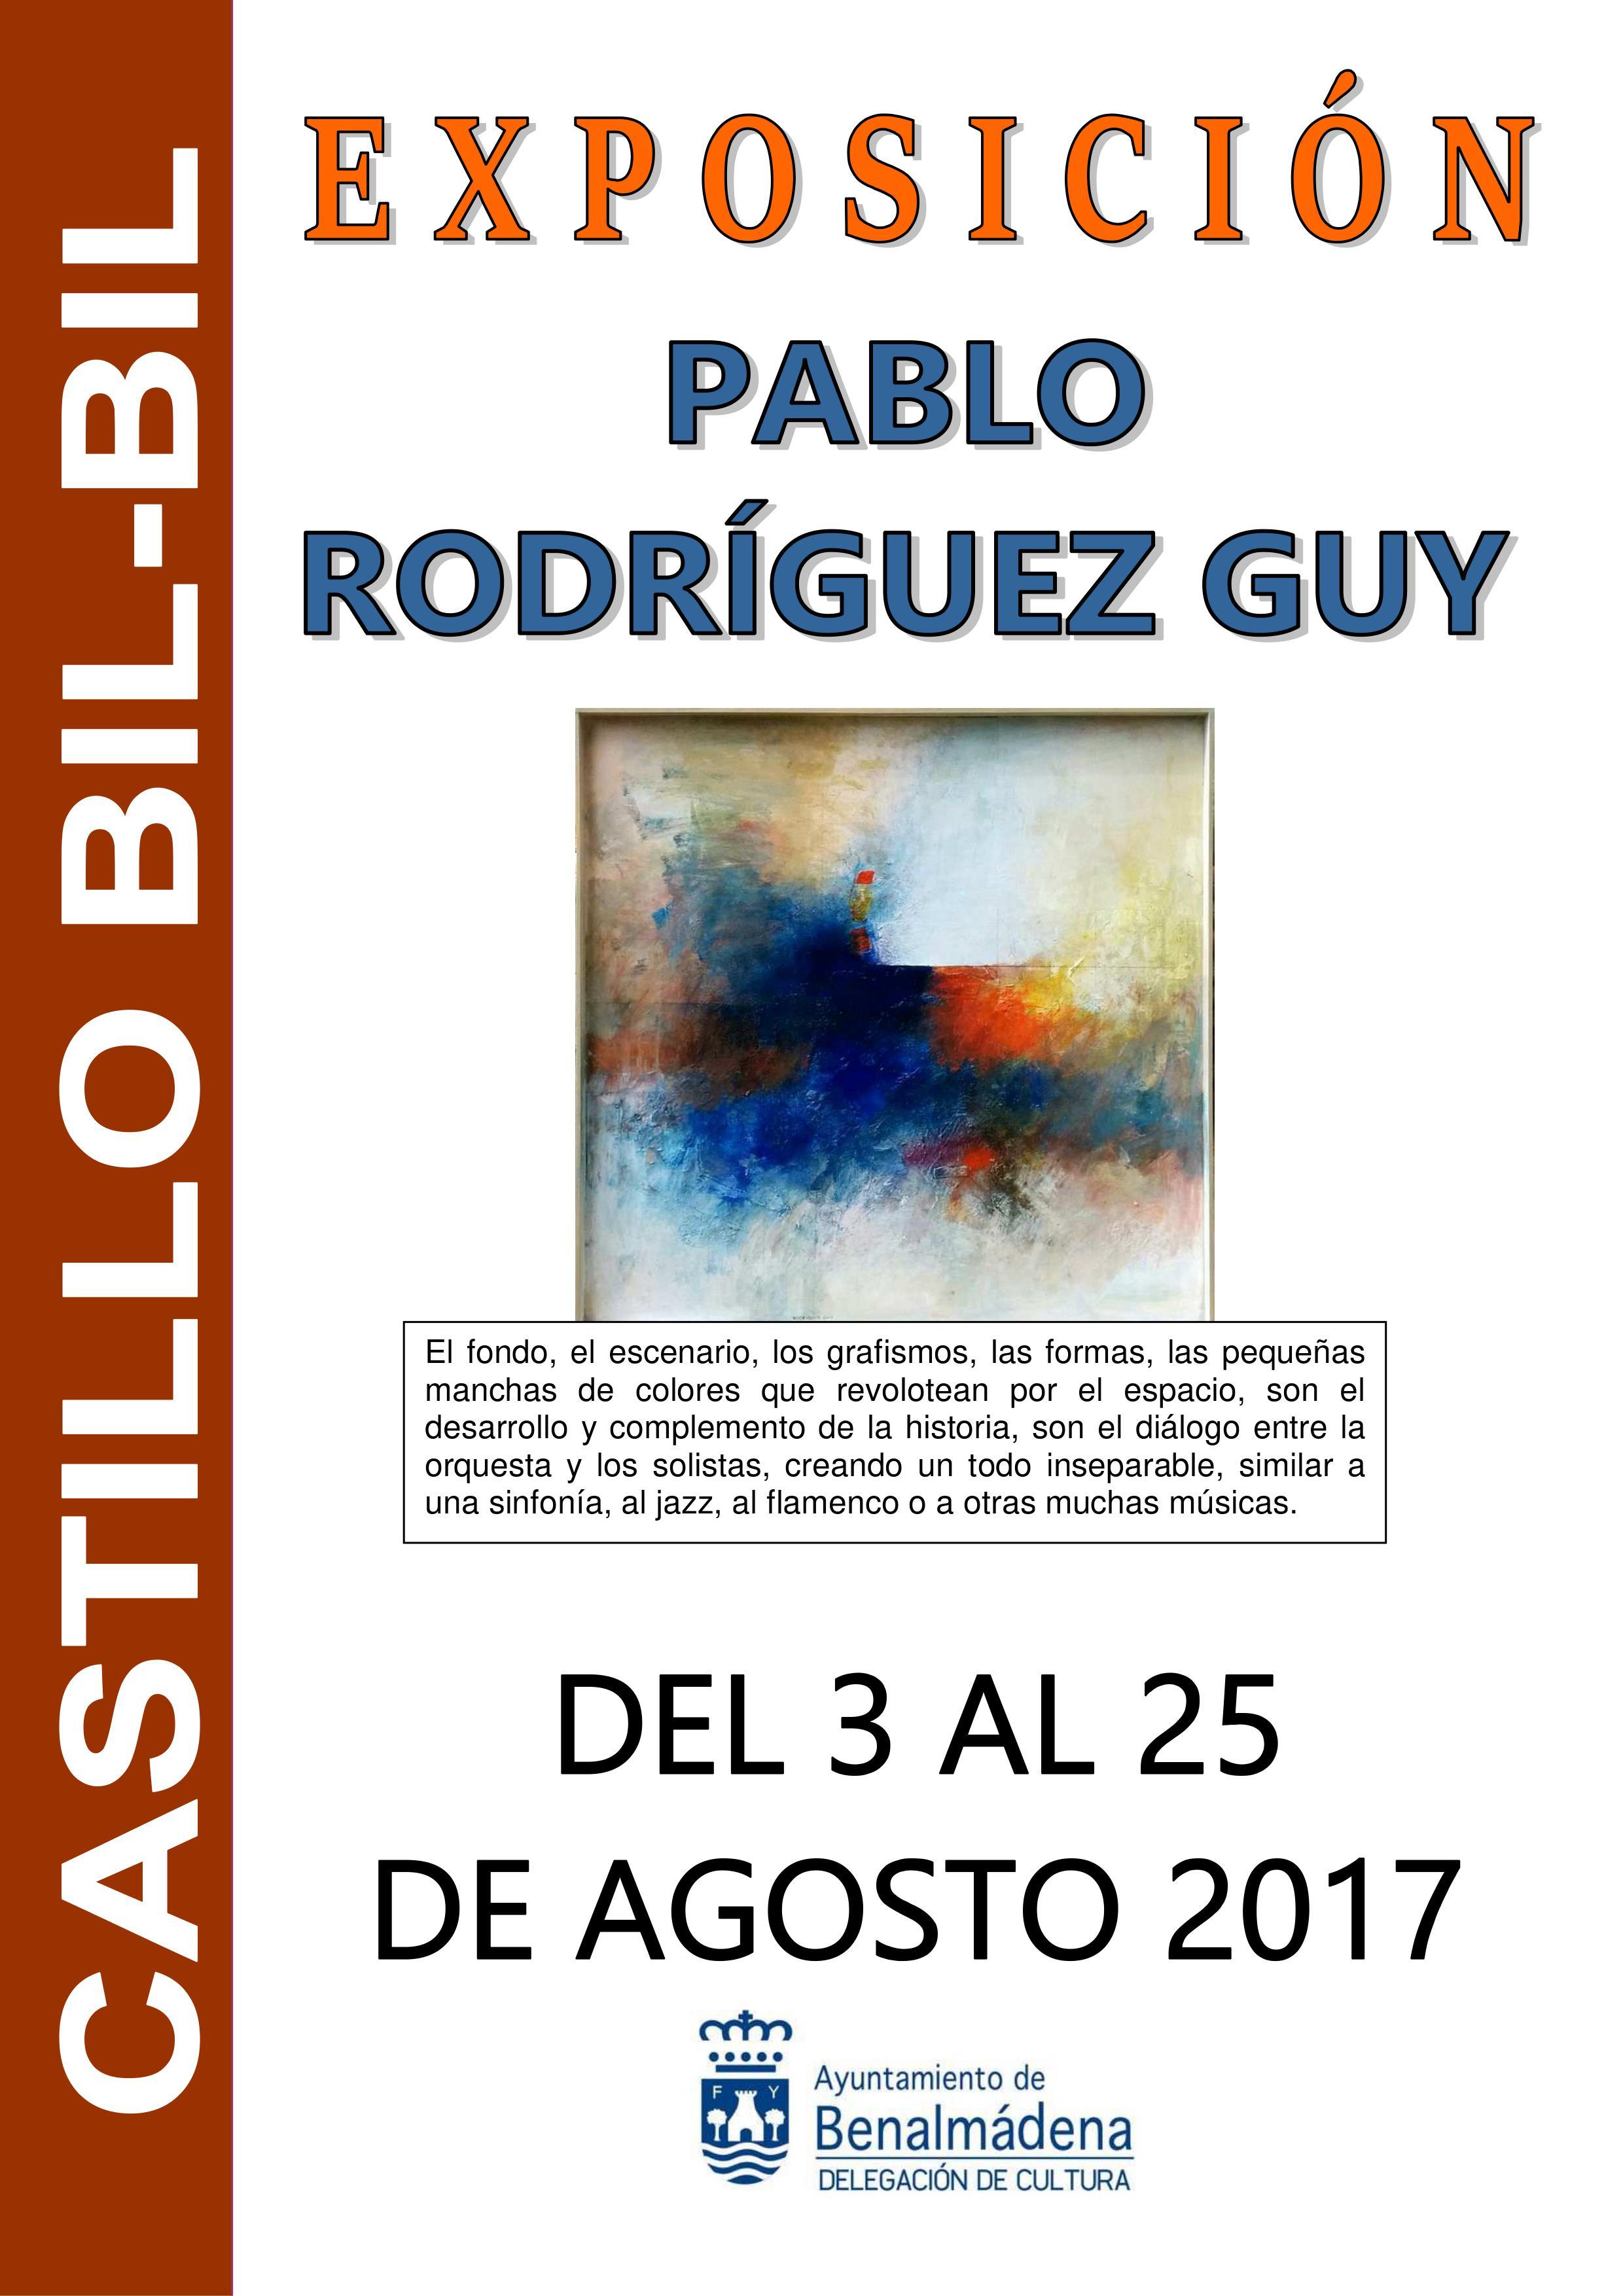 Pablo Rodríguez Guy